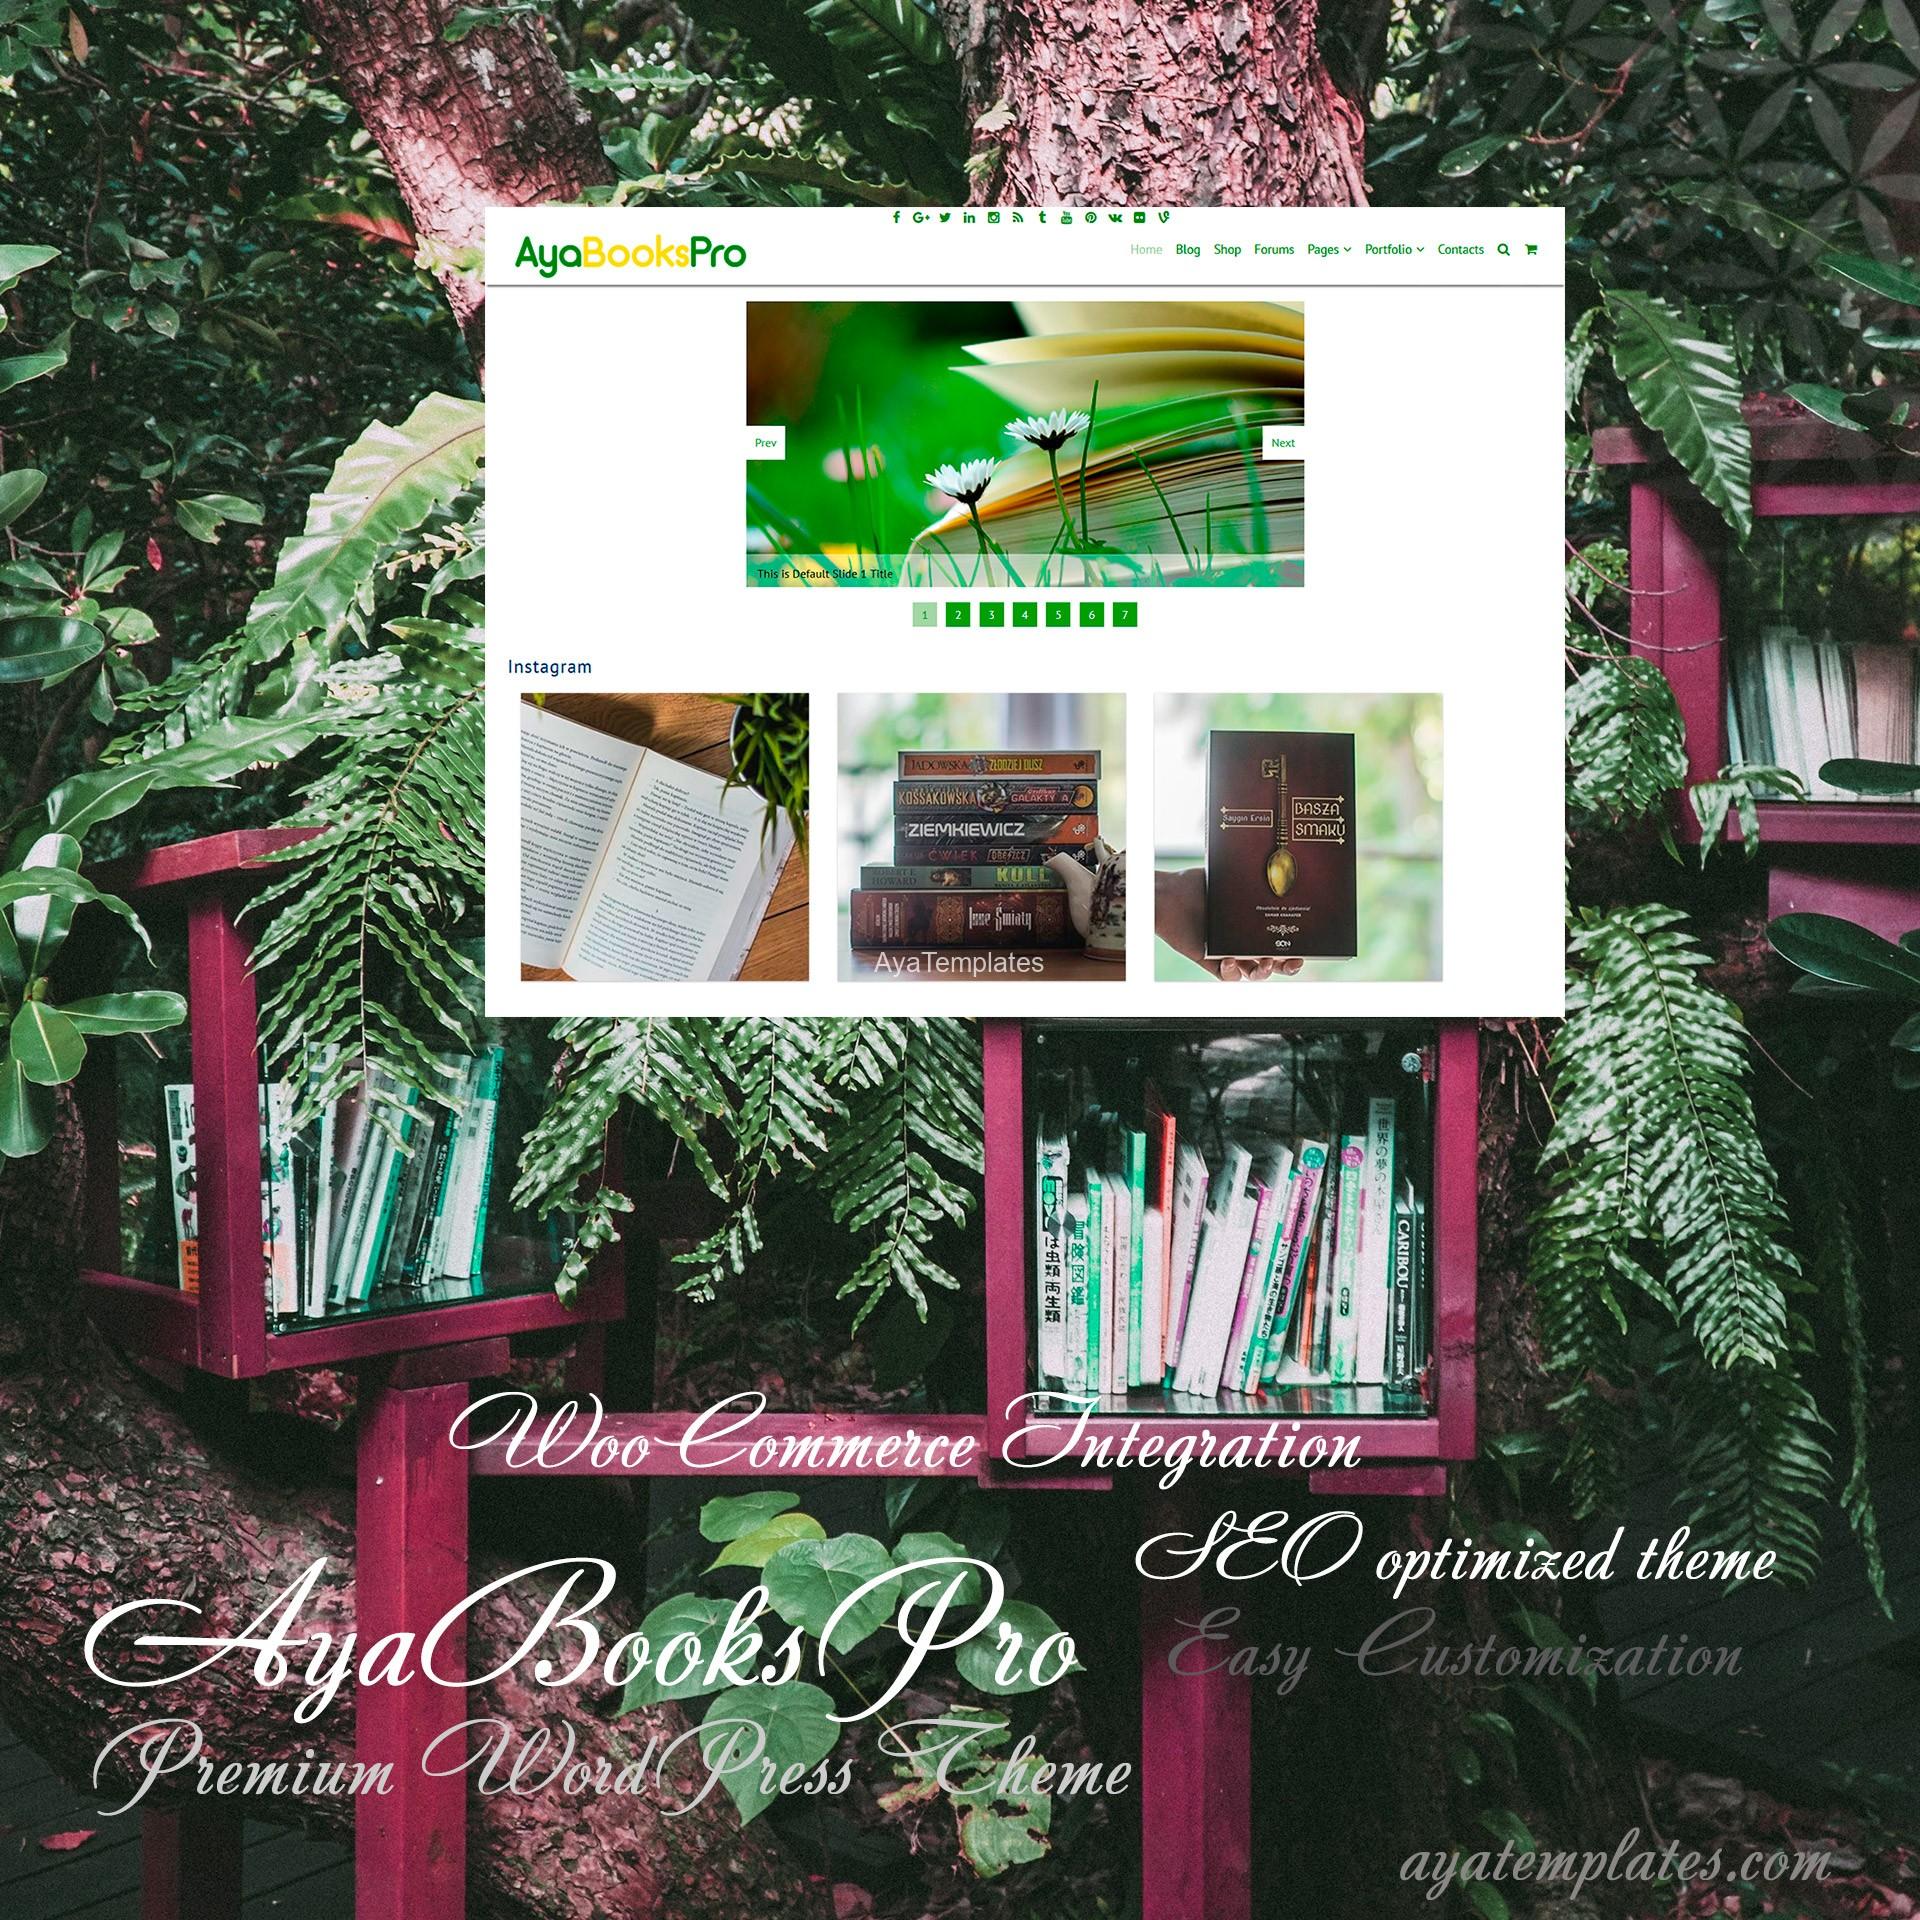 ayabookspro-premium-wordpress-theme-mockup-ayatemplates-com